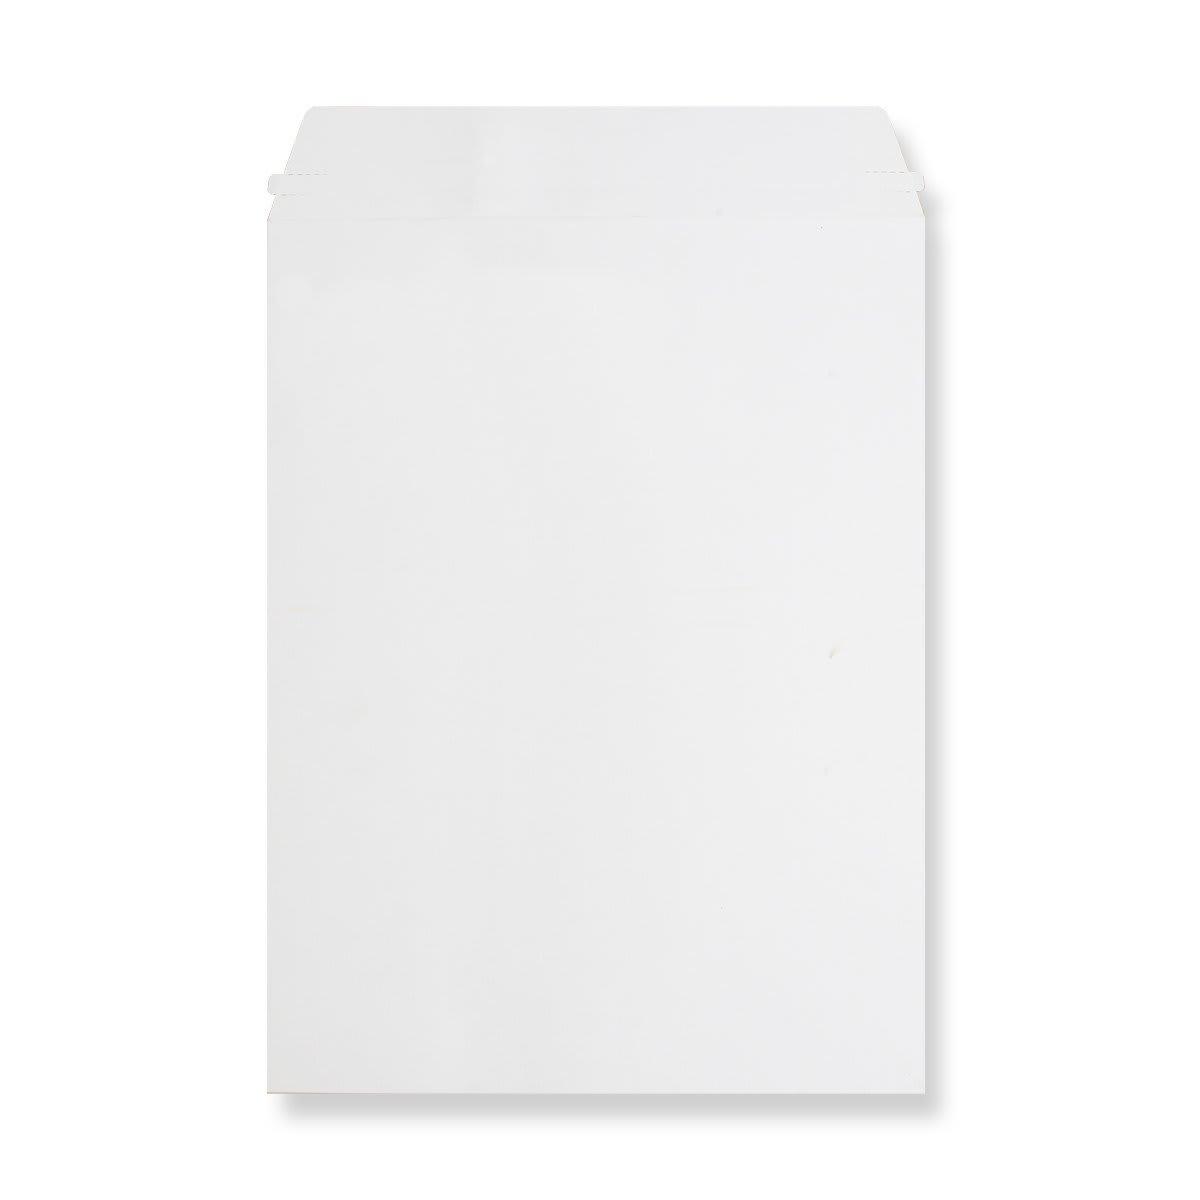 330 x 248mm WHITE ALL BOARD ENVELOPES